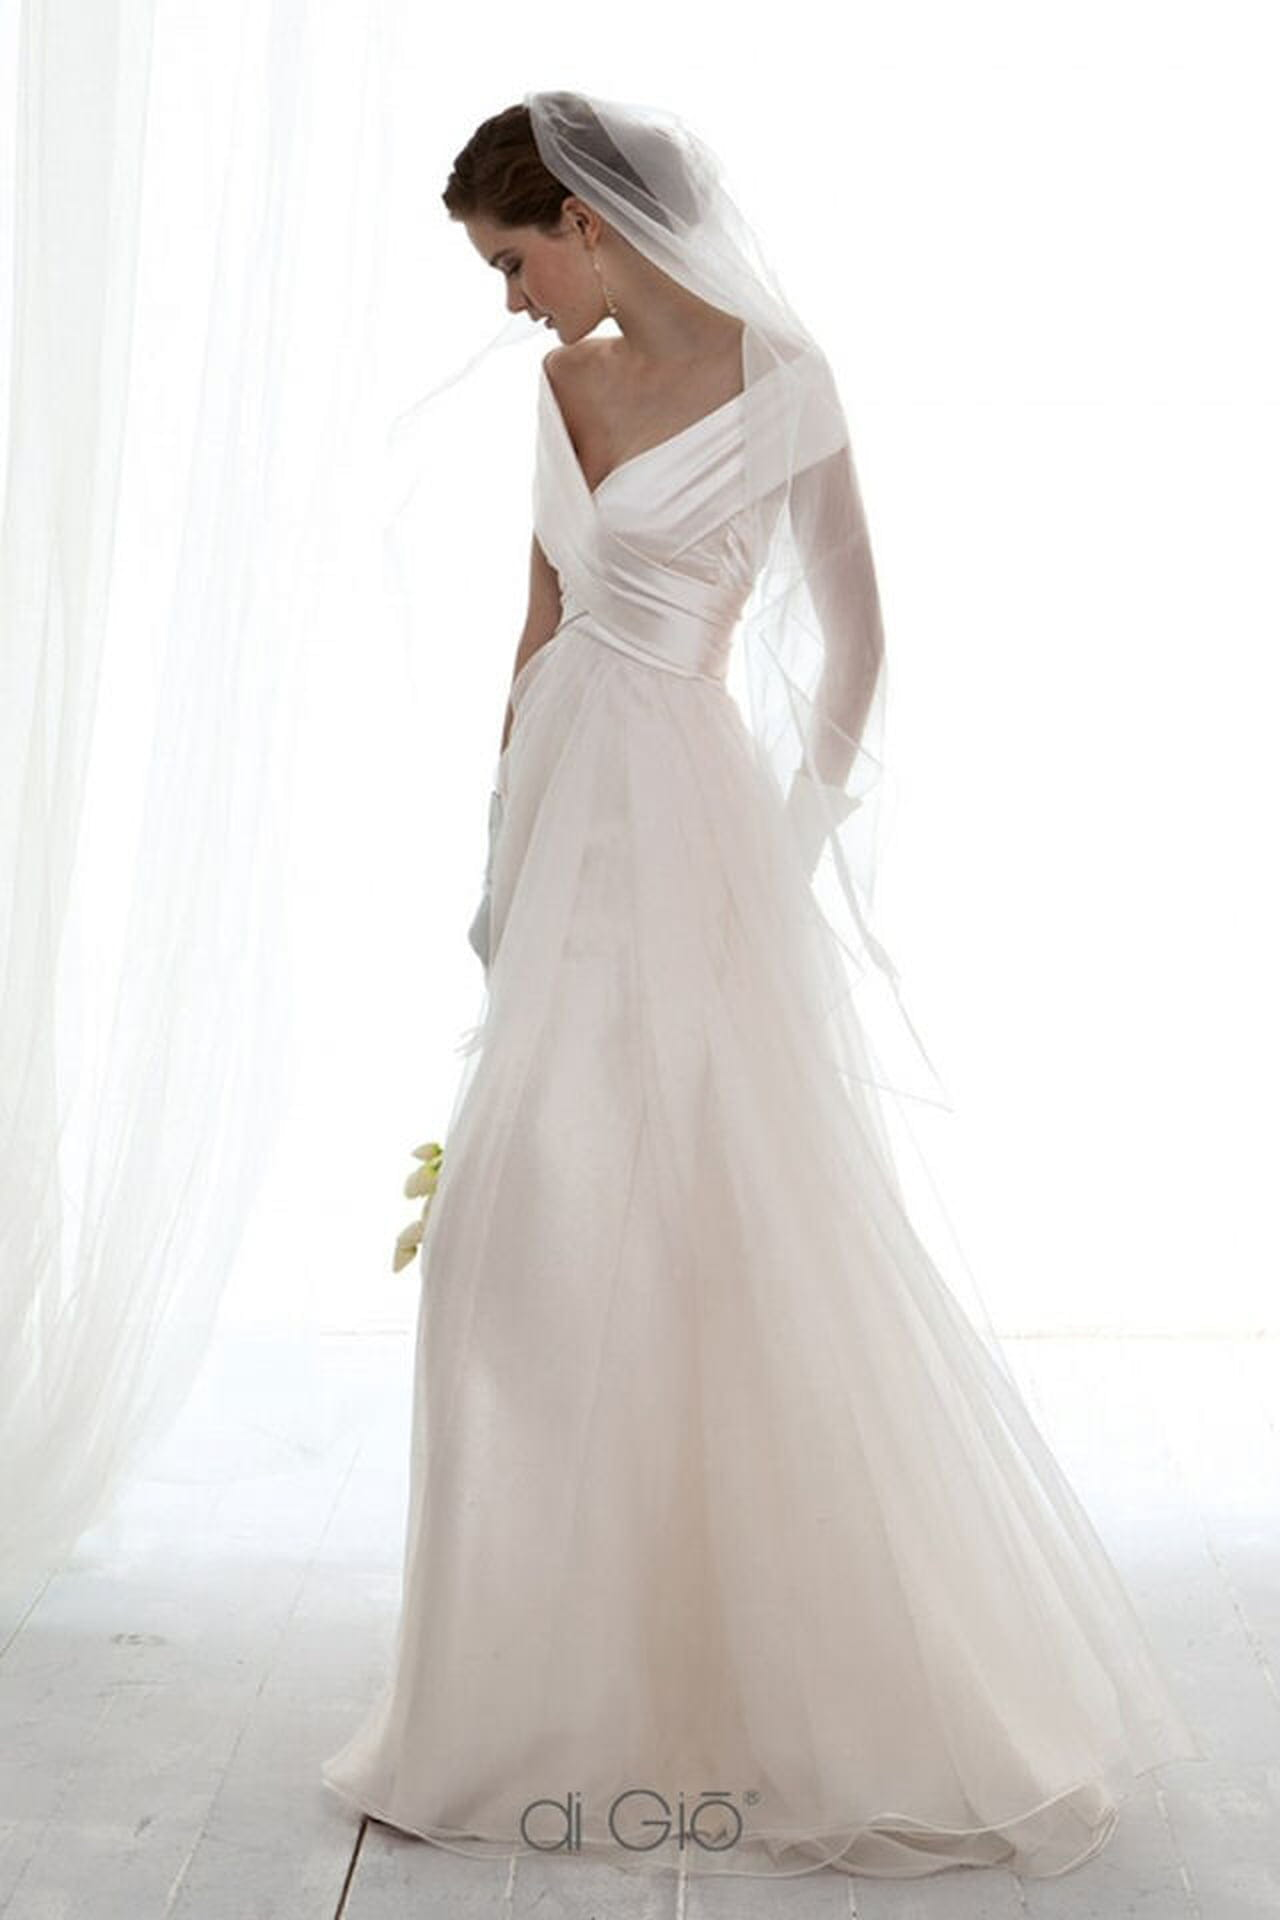 c34673ac5529 Le Spose di Giò  gli abiti più belli